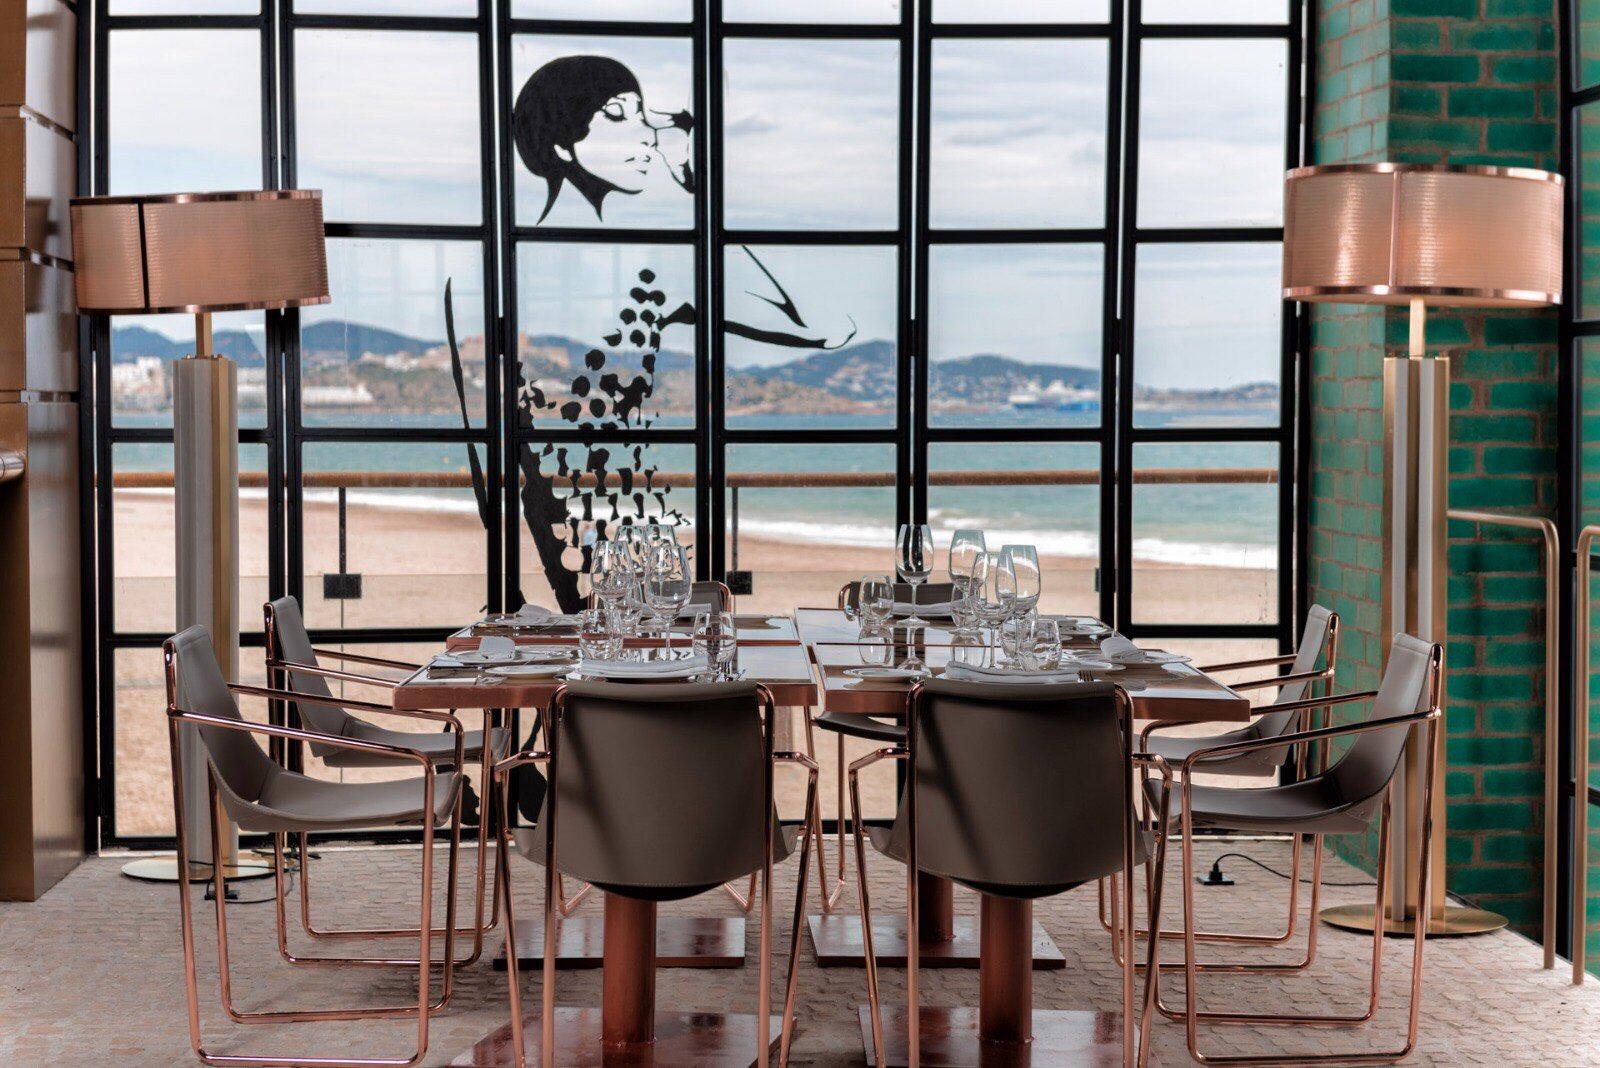 Ya hemos abierto #TATELIbiza! @TatelRestaurant @PauGasol @RafaelNadal @#TATELMadrid #TATELMiami https://t.co/LHe1bWBSgS